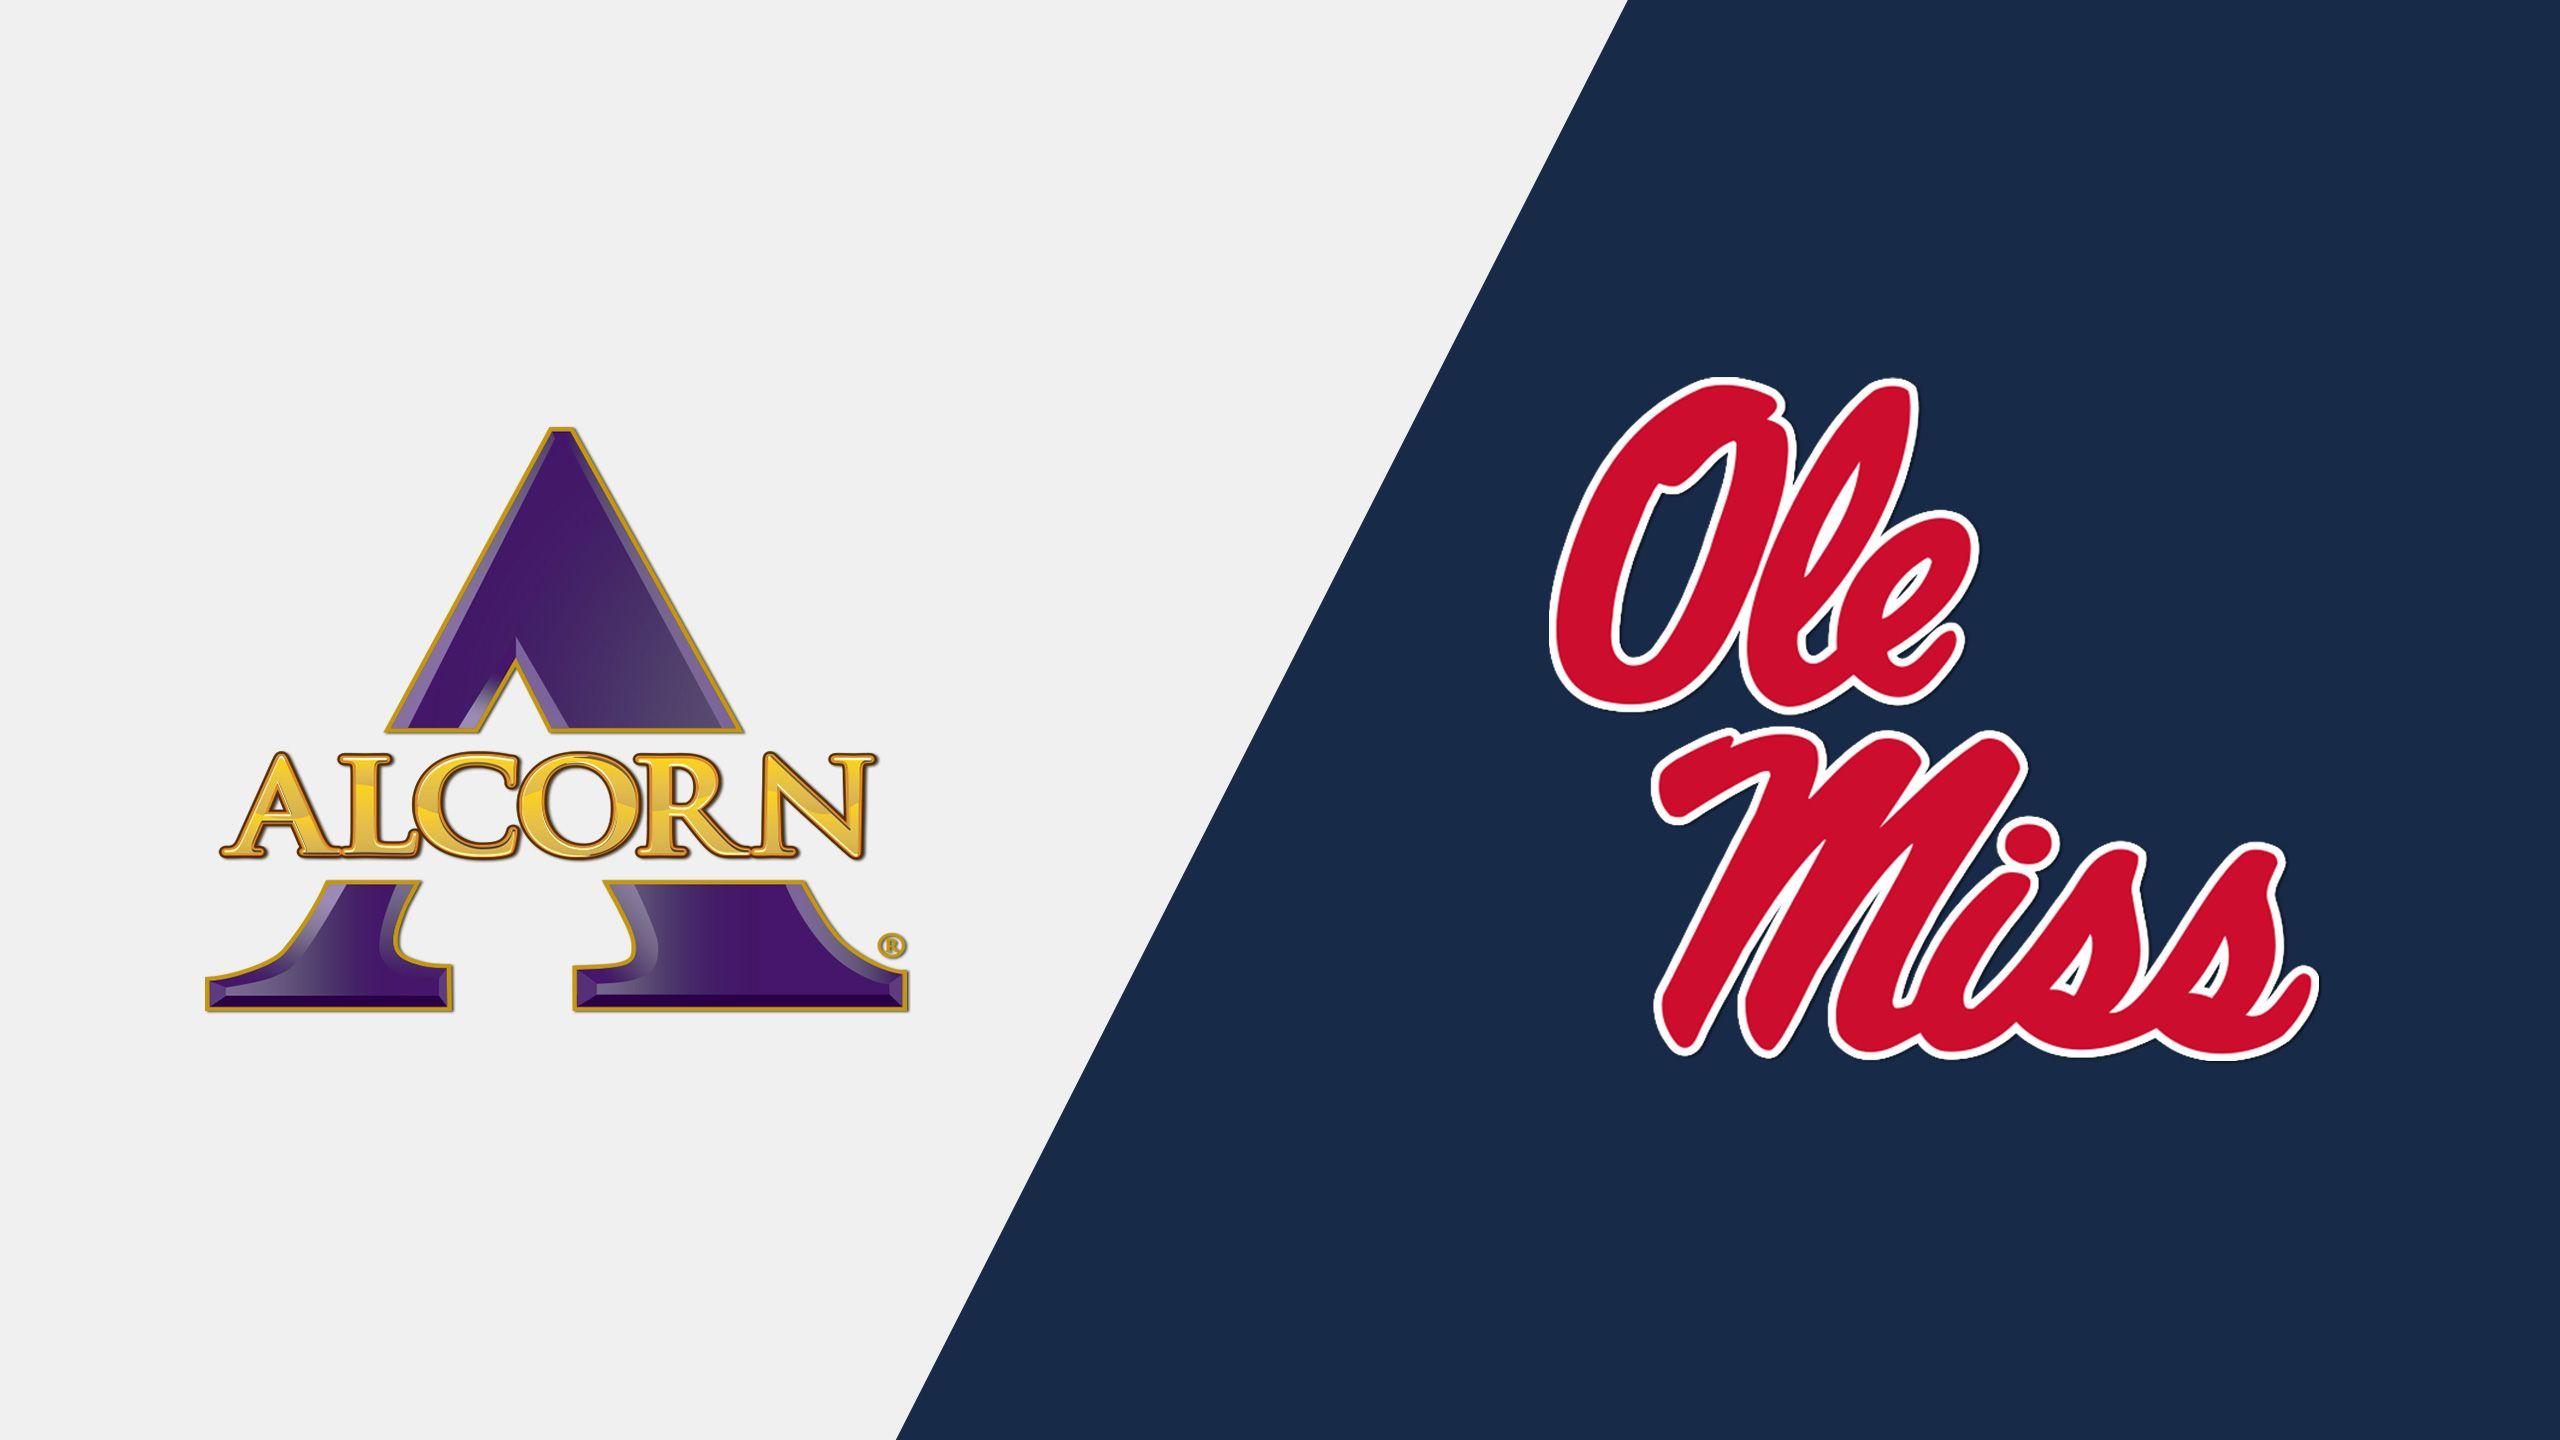 Alcorn State vs. Ole Miss (Softball)